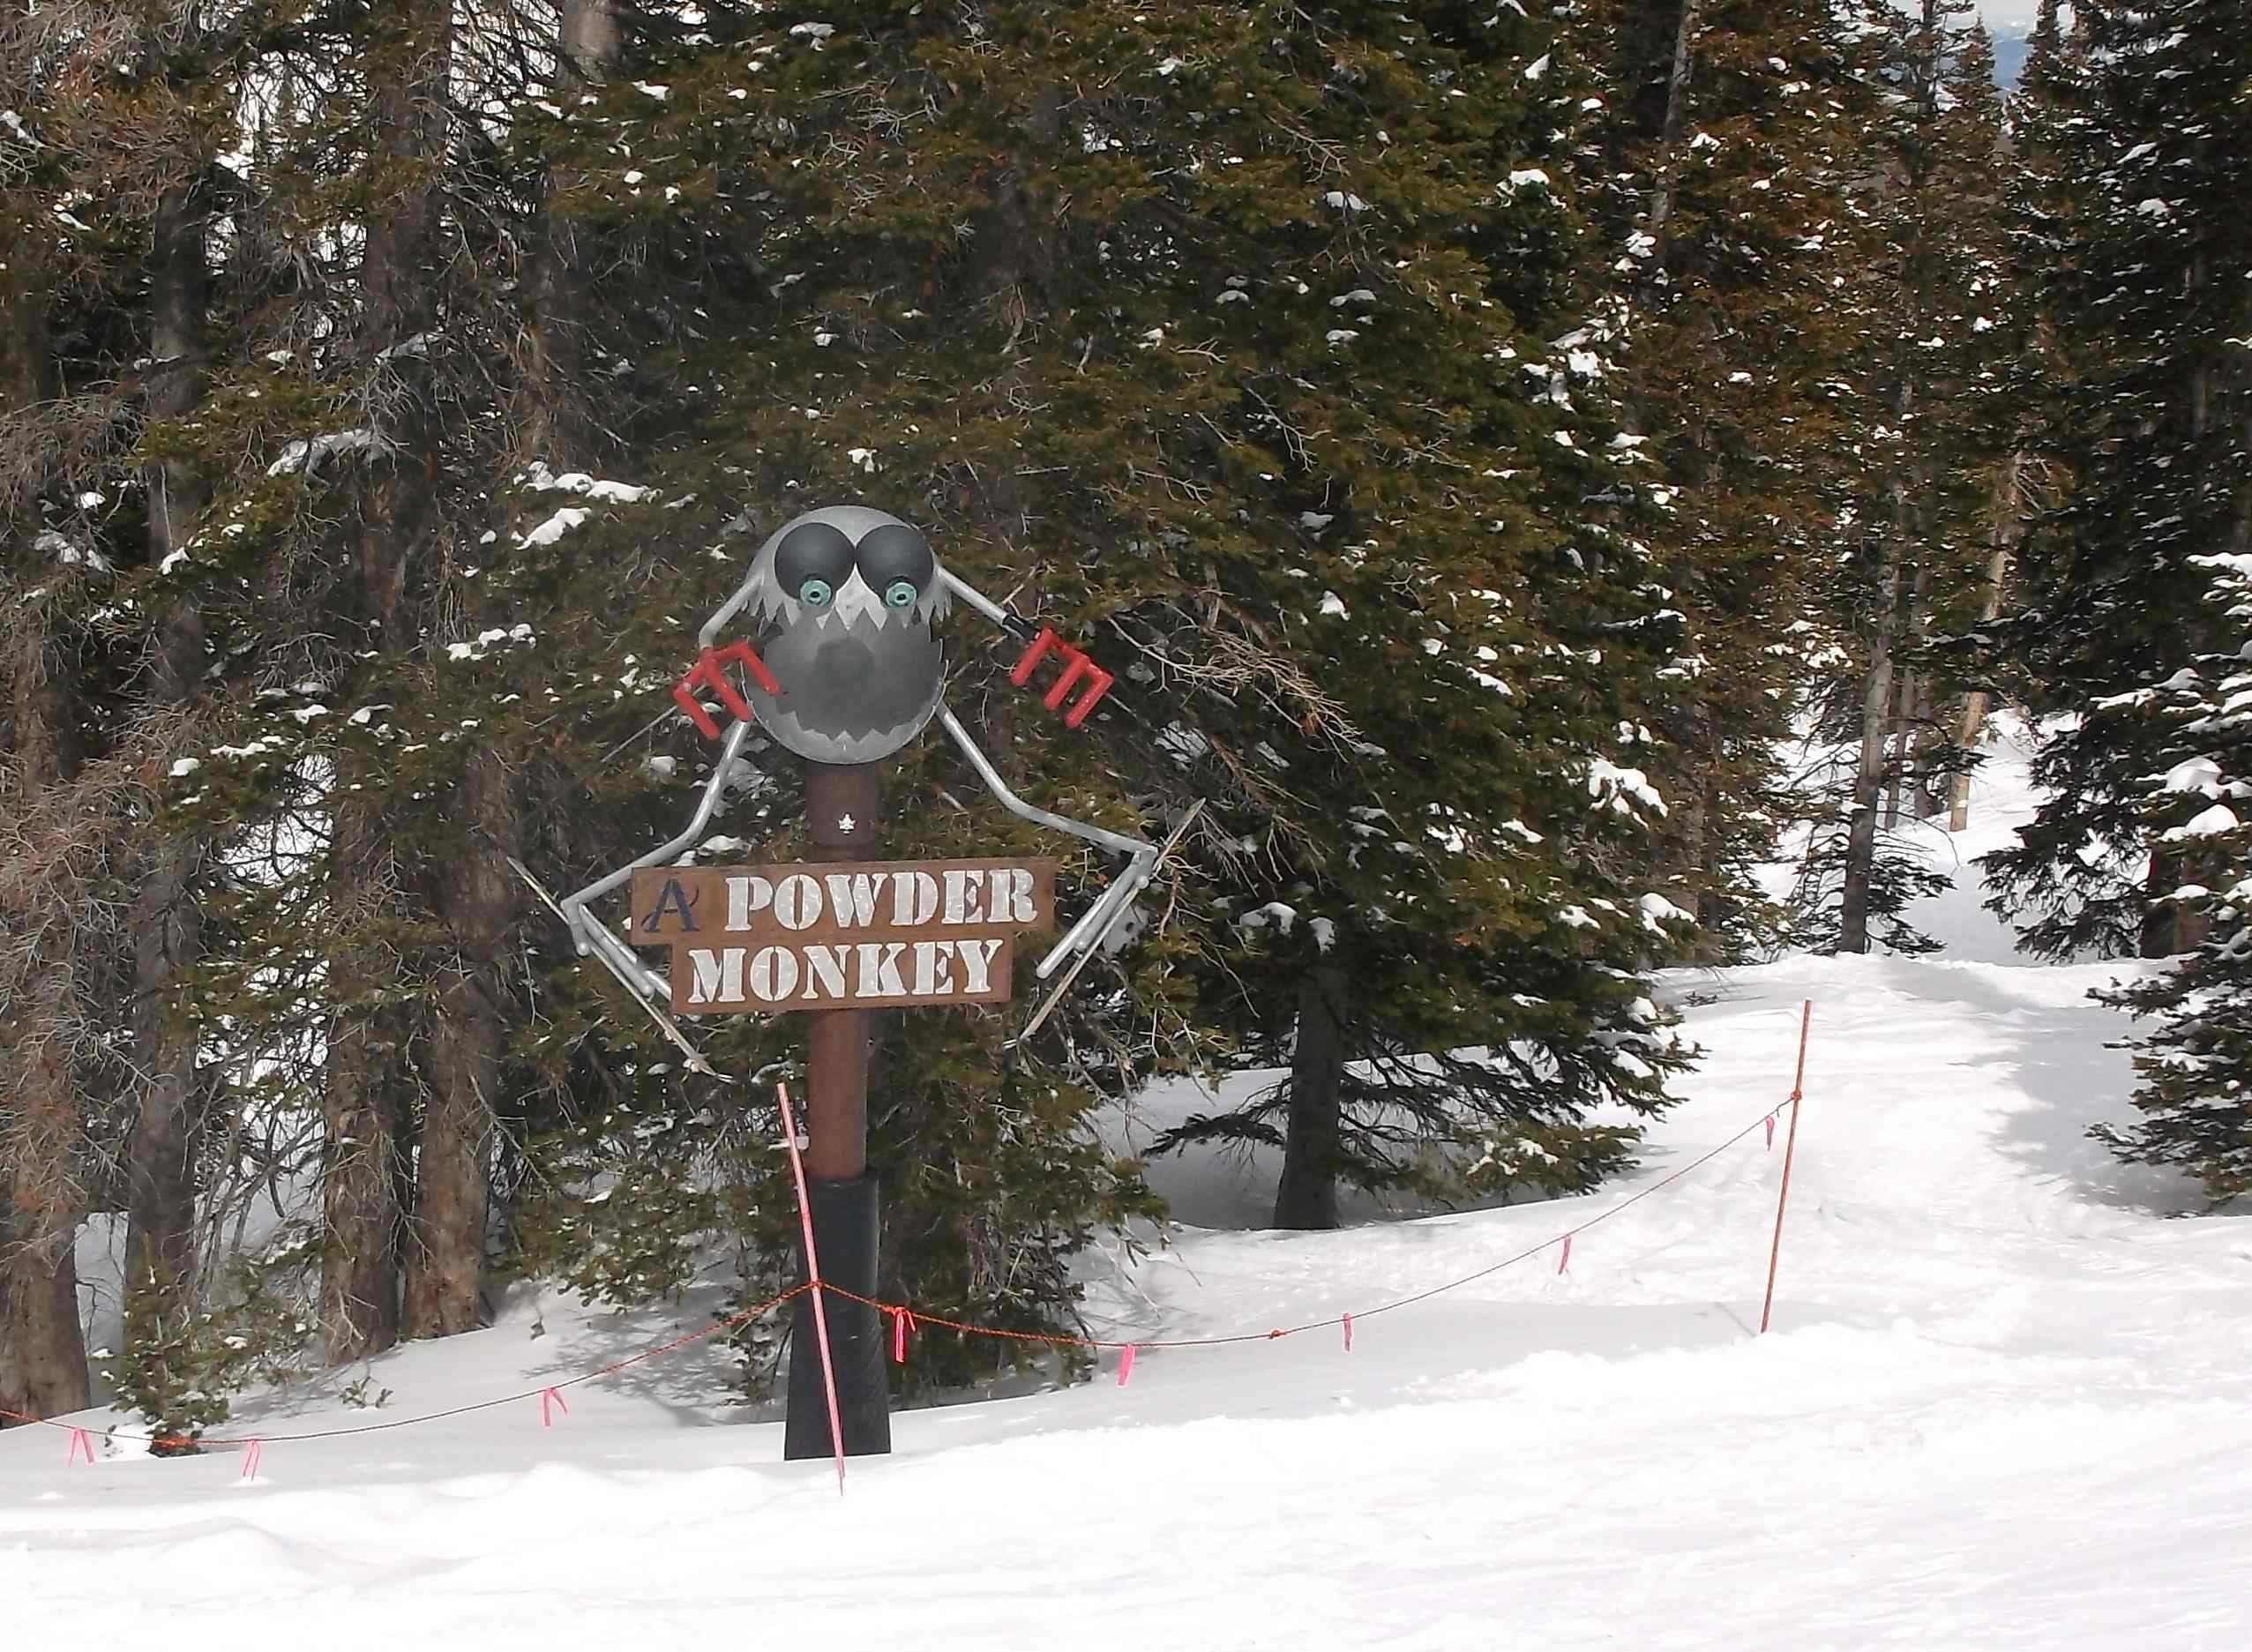 Park City Powder Monkey